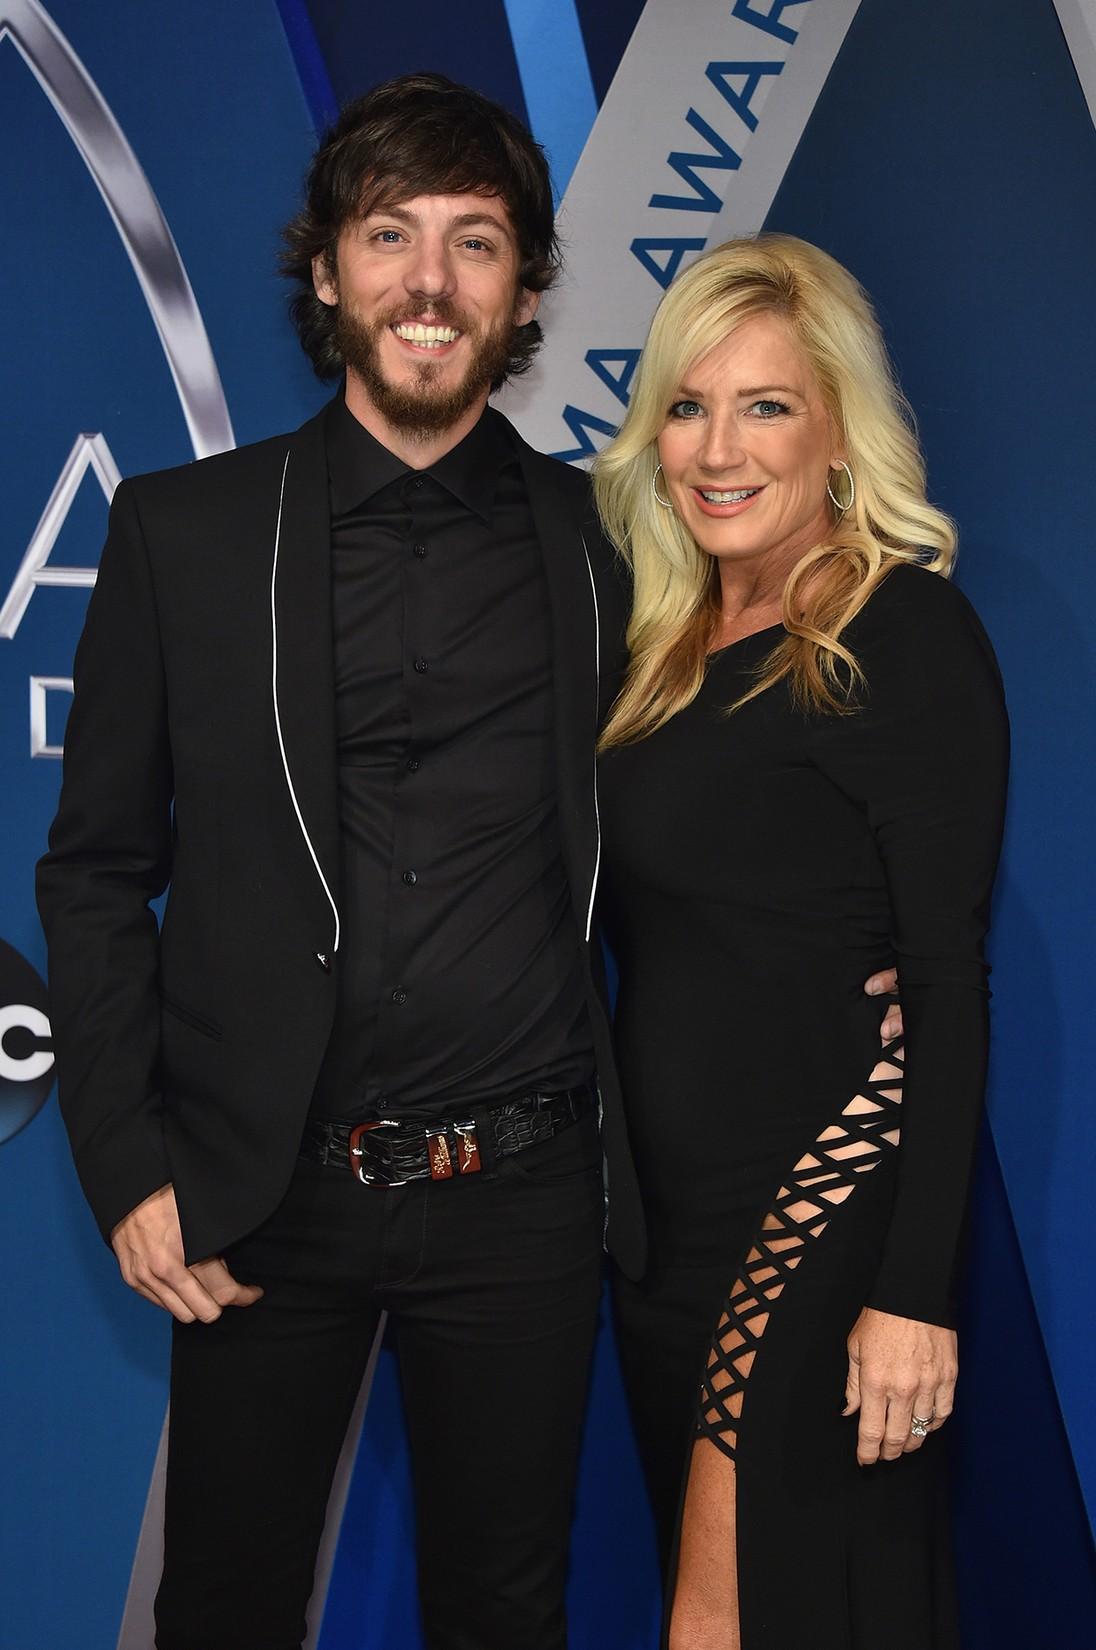 Chris Janson and Kelly Lynn